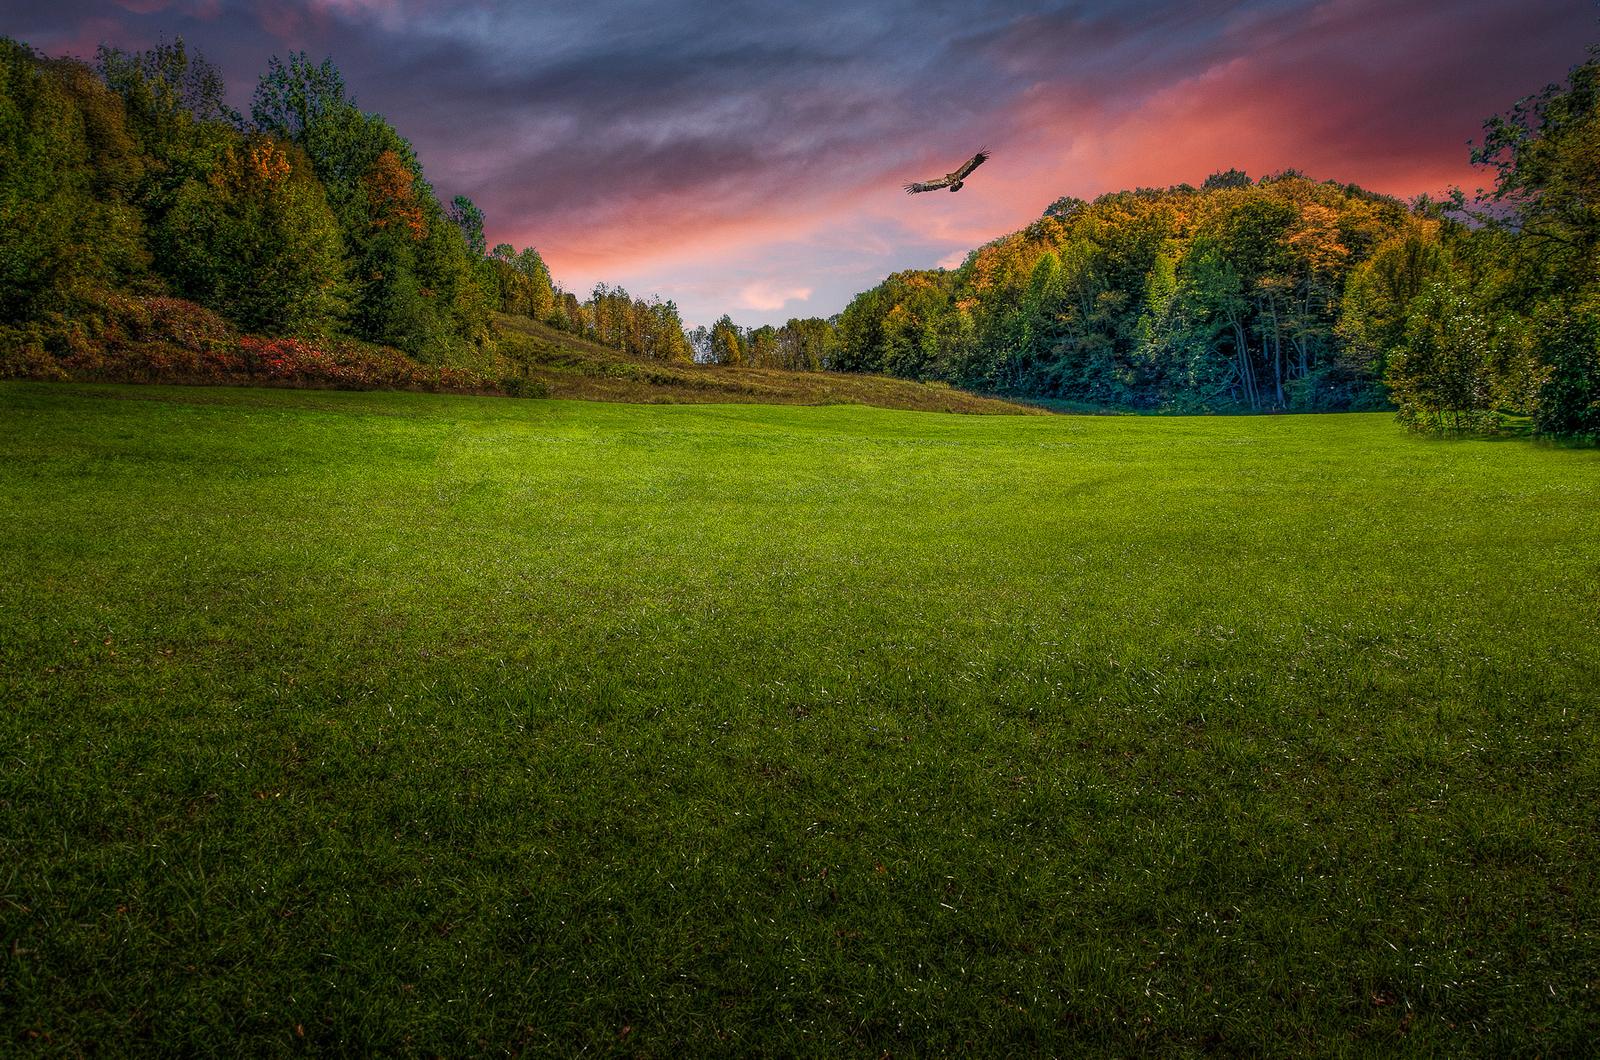 1000 Lawns Photo Contest Winner!